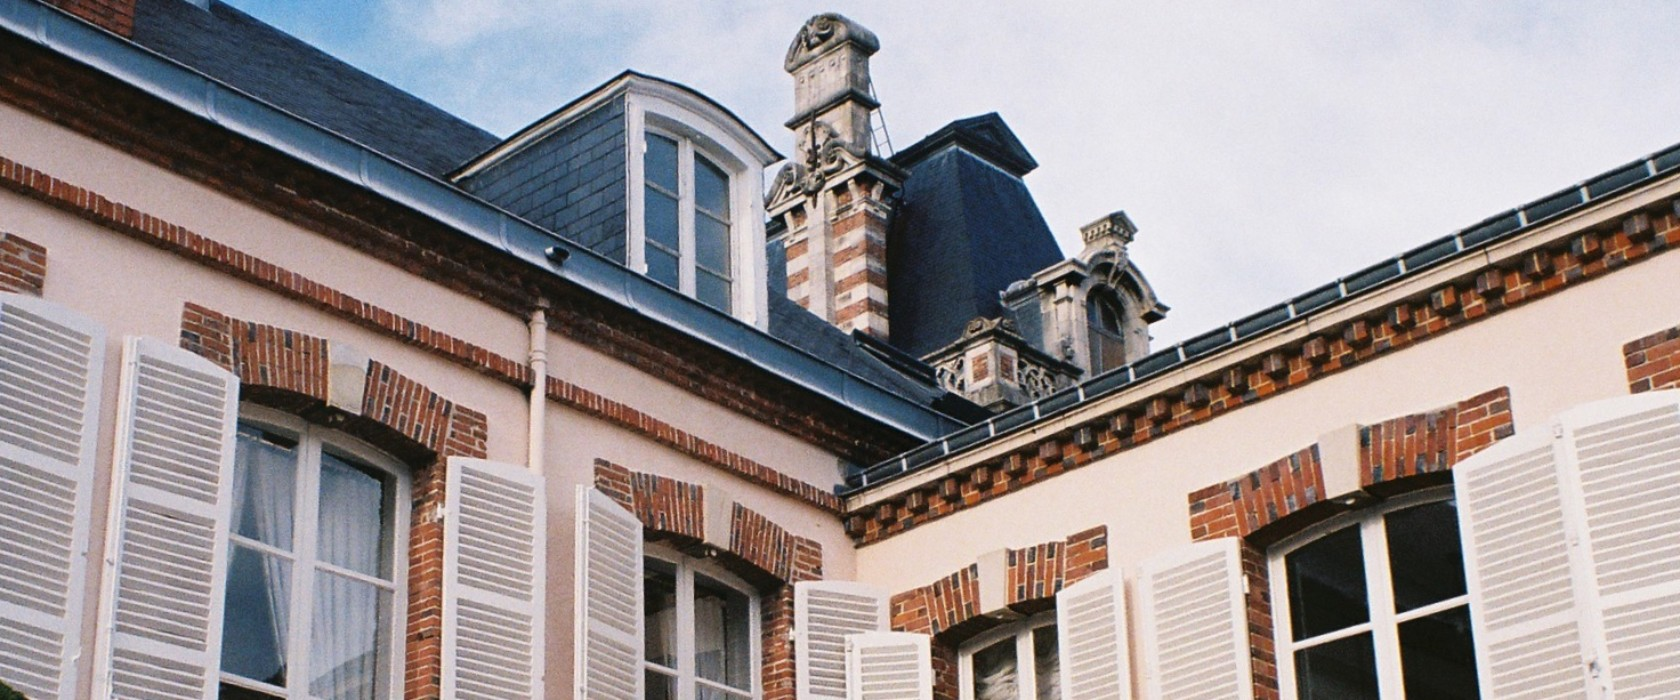 belle facade maison iu33 montrealeast. Black Bedroom Furniture Sets. Home Design Ideas